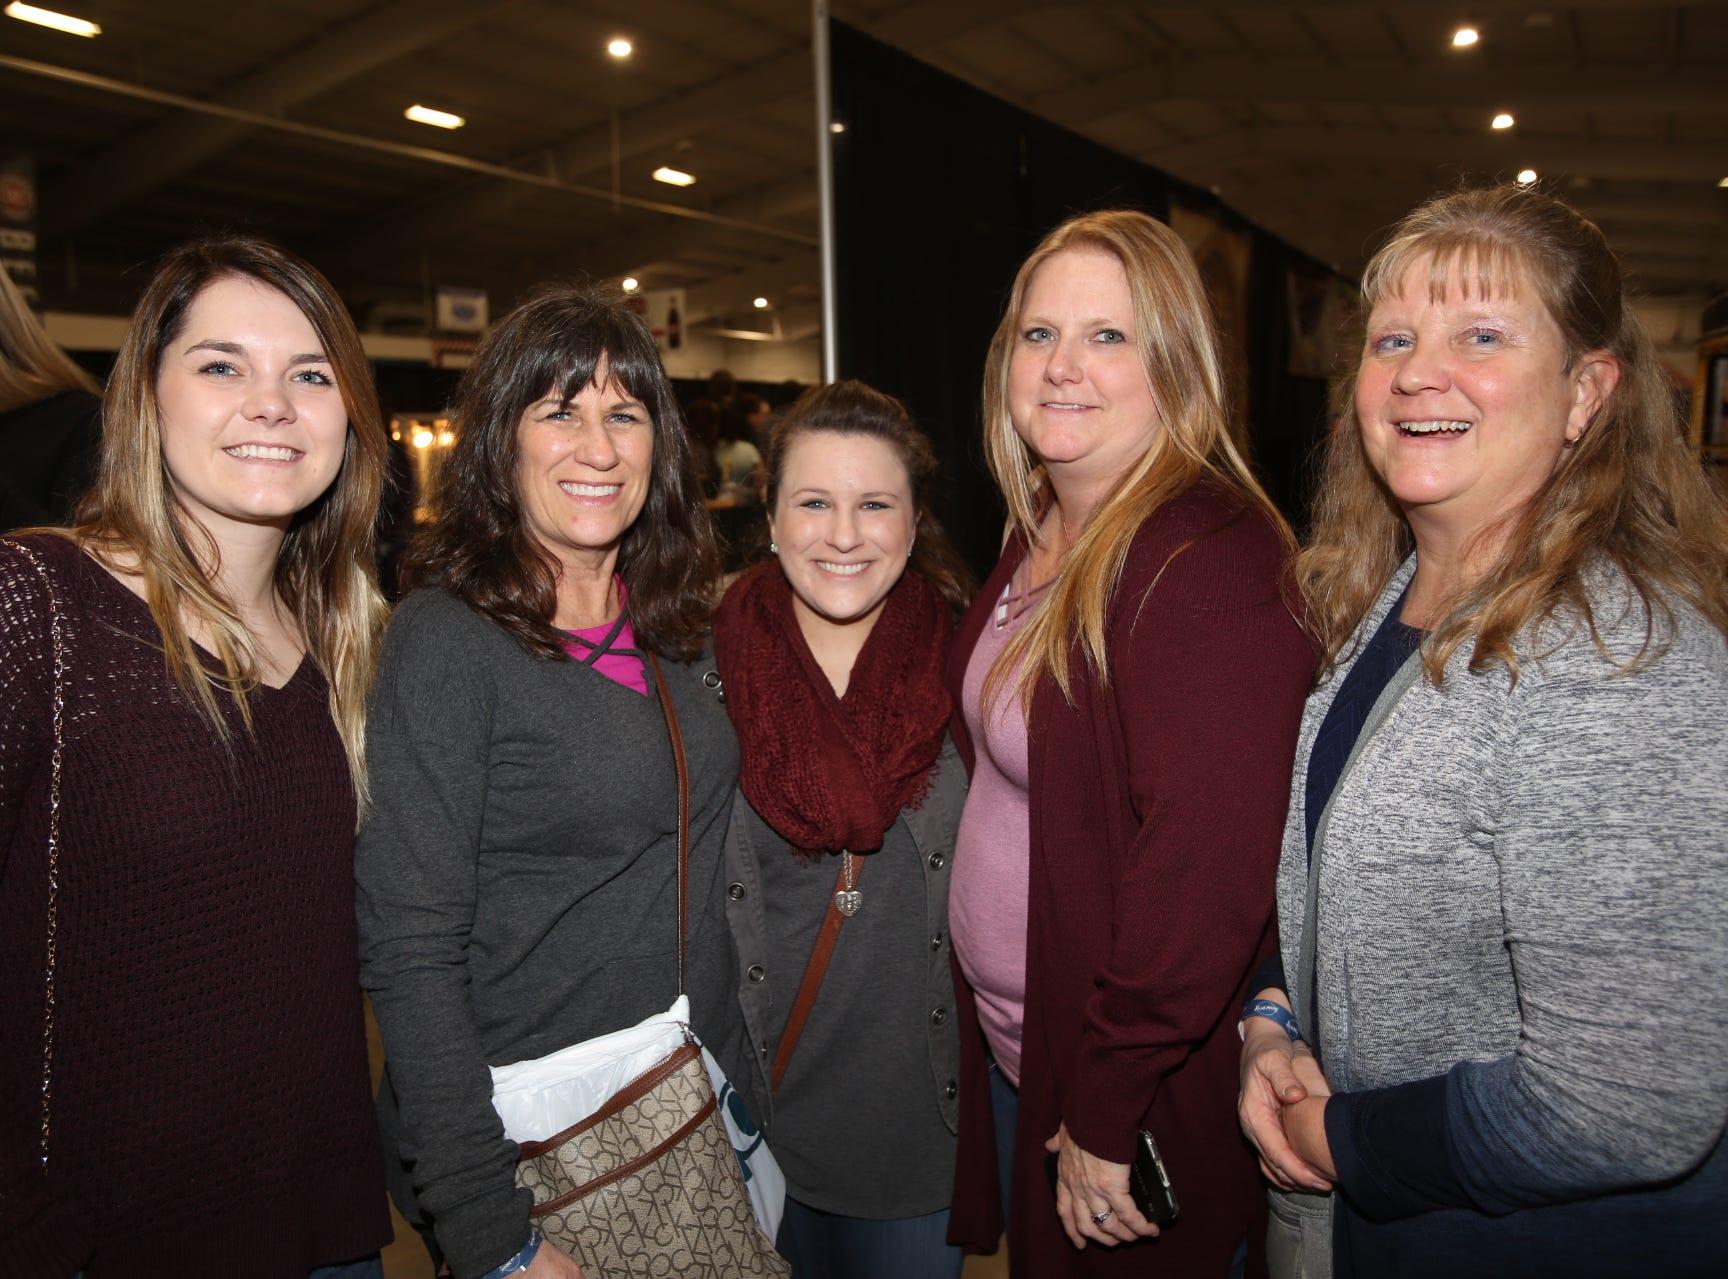 Sarah Godfrey, Janet Glor, Danielle McCrickard, Kristine Pope, and Mary Seiner